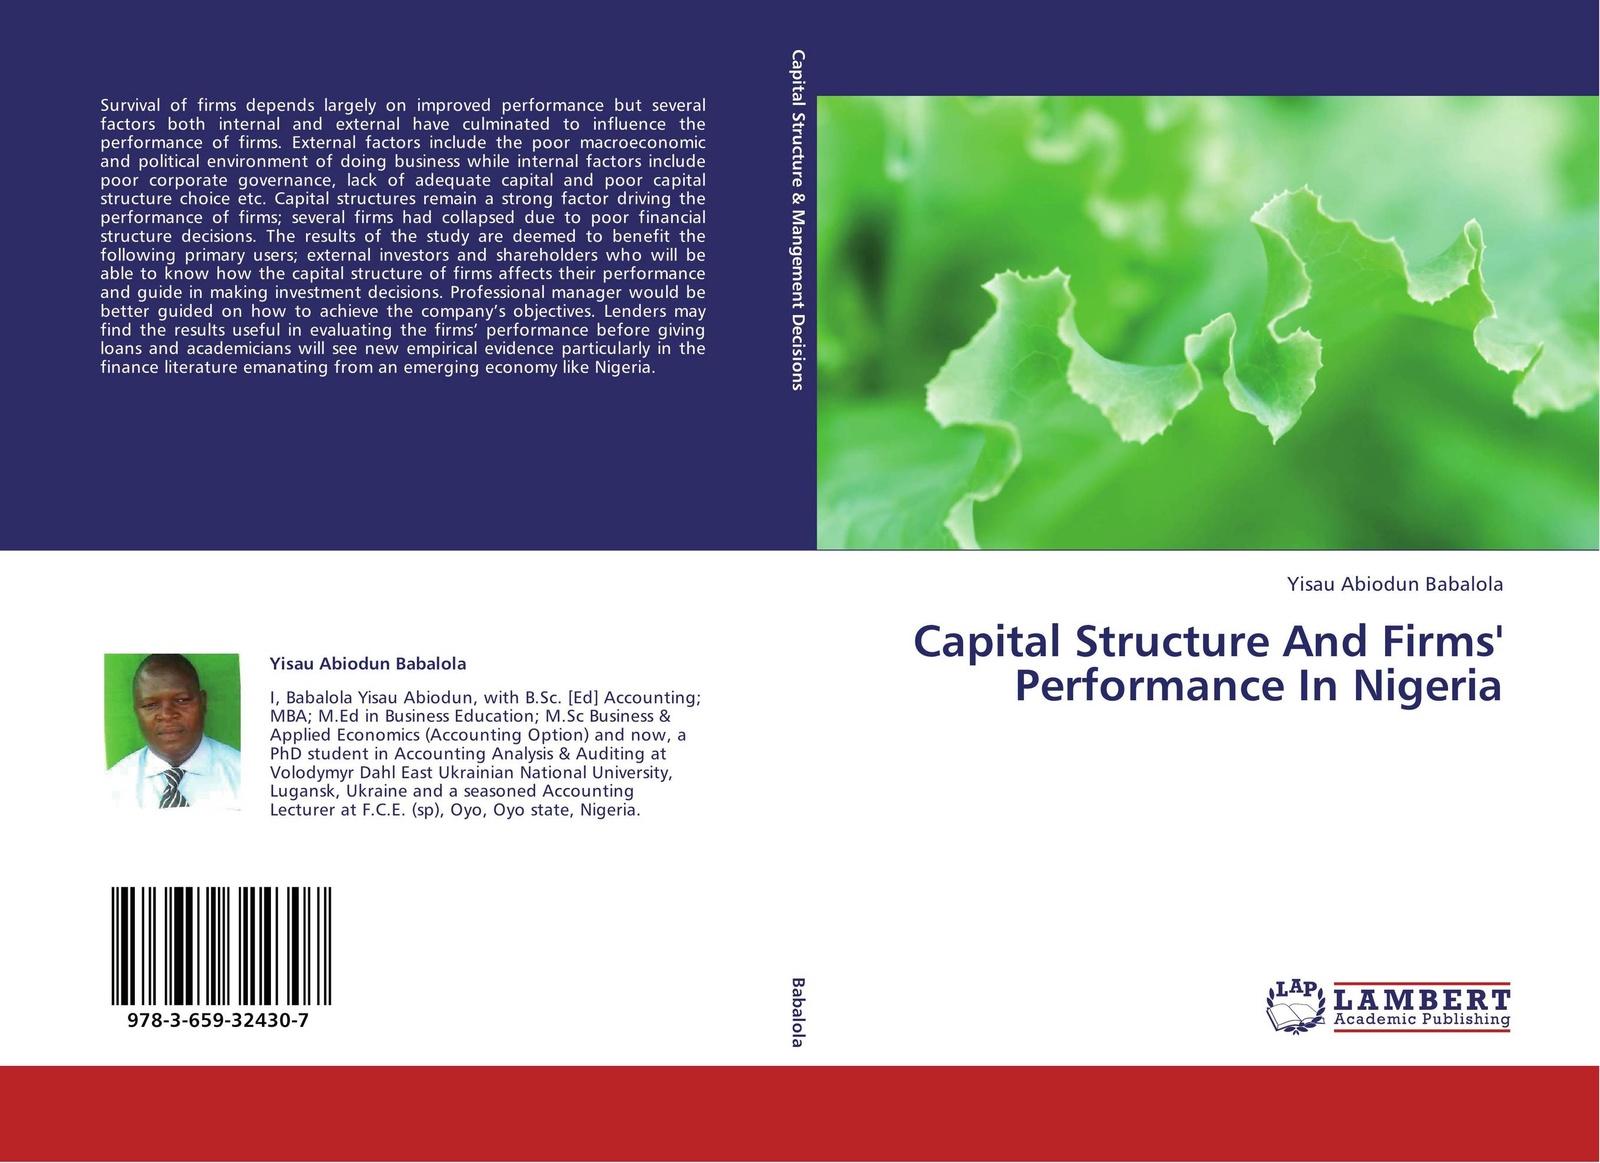 Yisau Abiodun Babalola Capital Structure And Firms' Performance In Nigeria цена в Москве и Питере